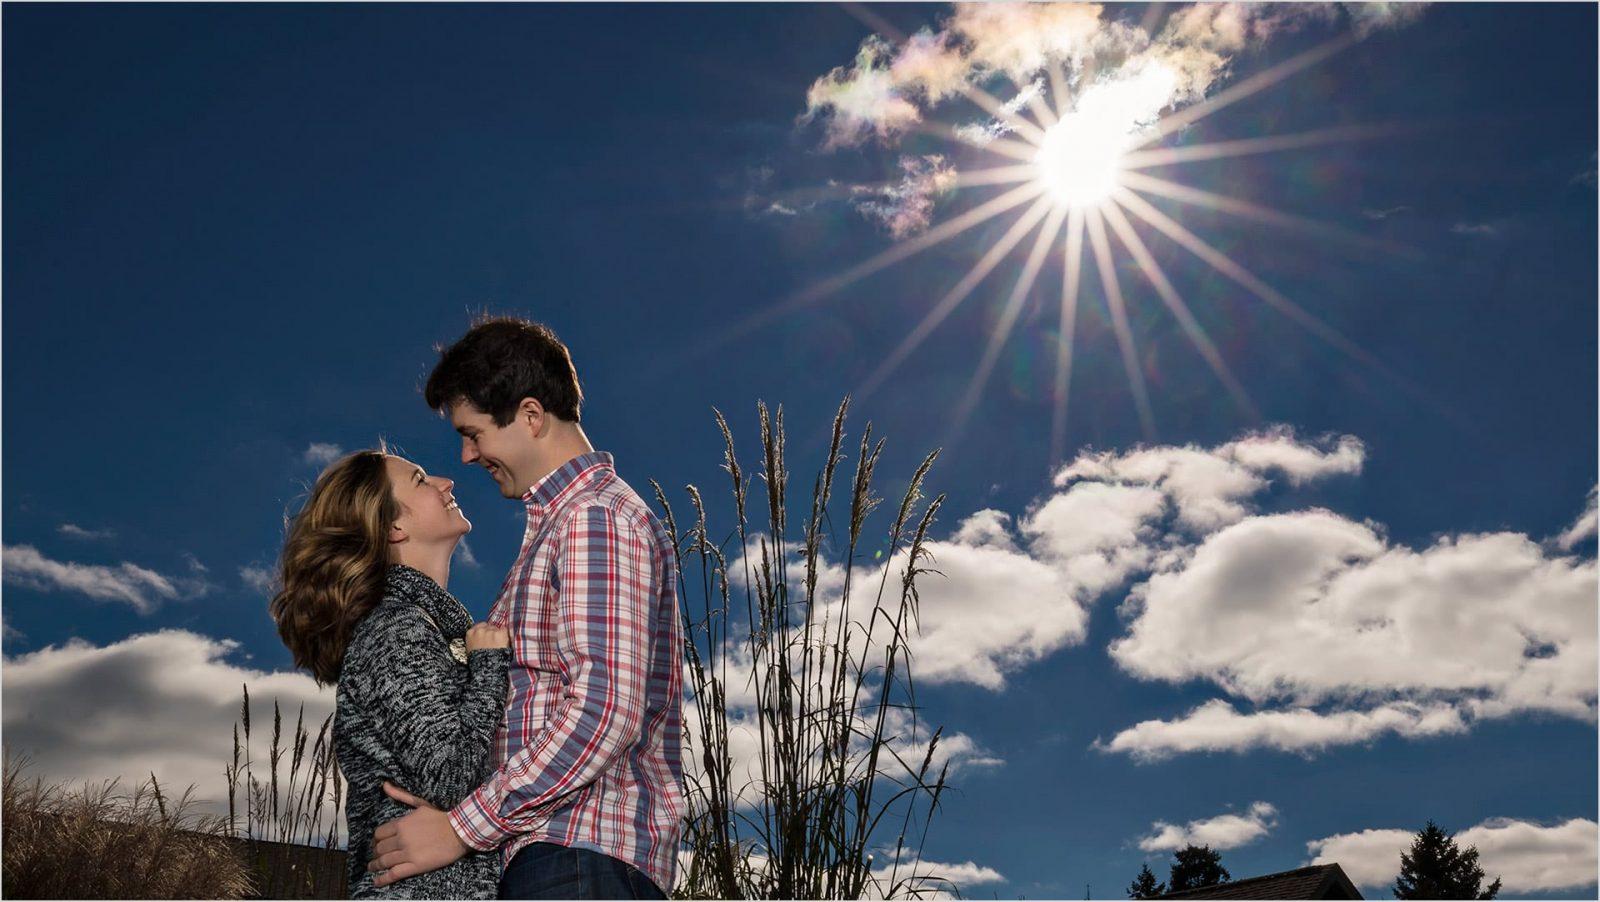 Cox Arboretum Dayton Engagement photos, sunburst